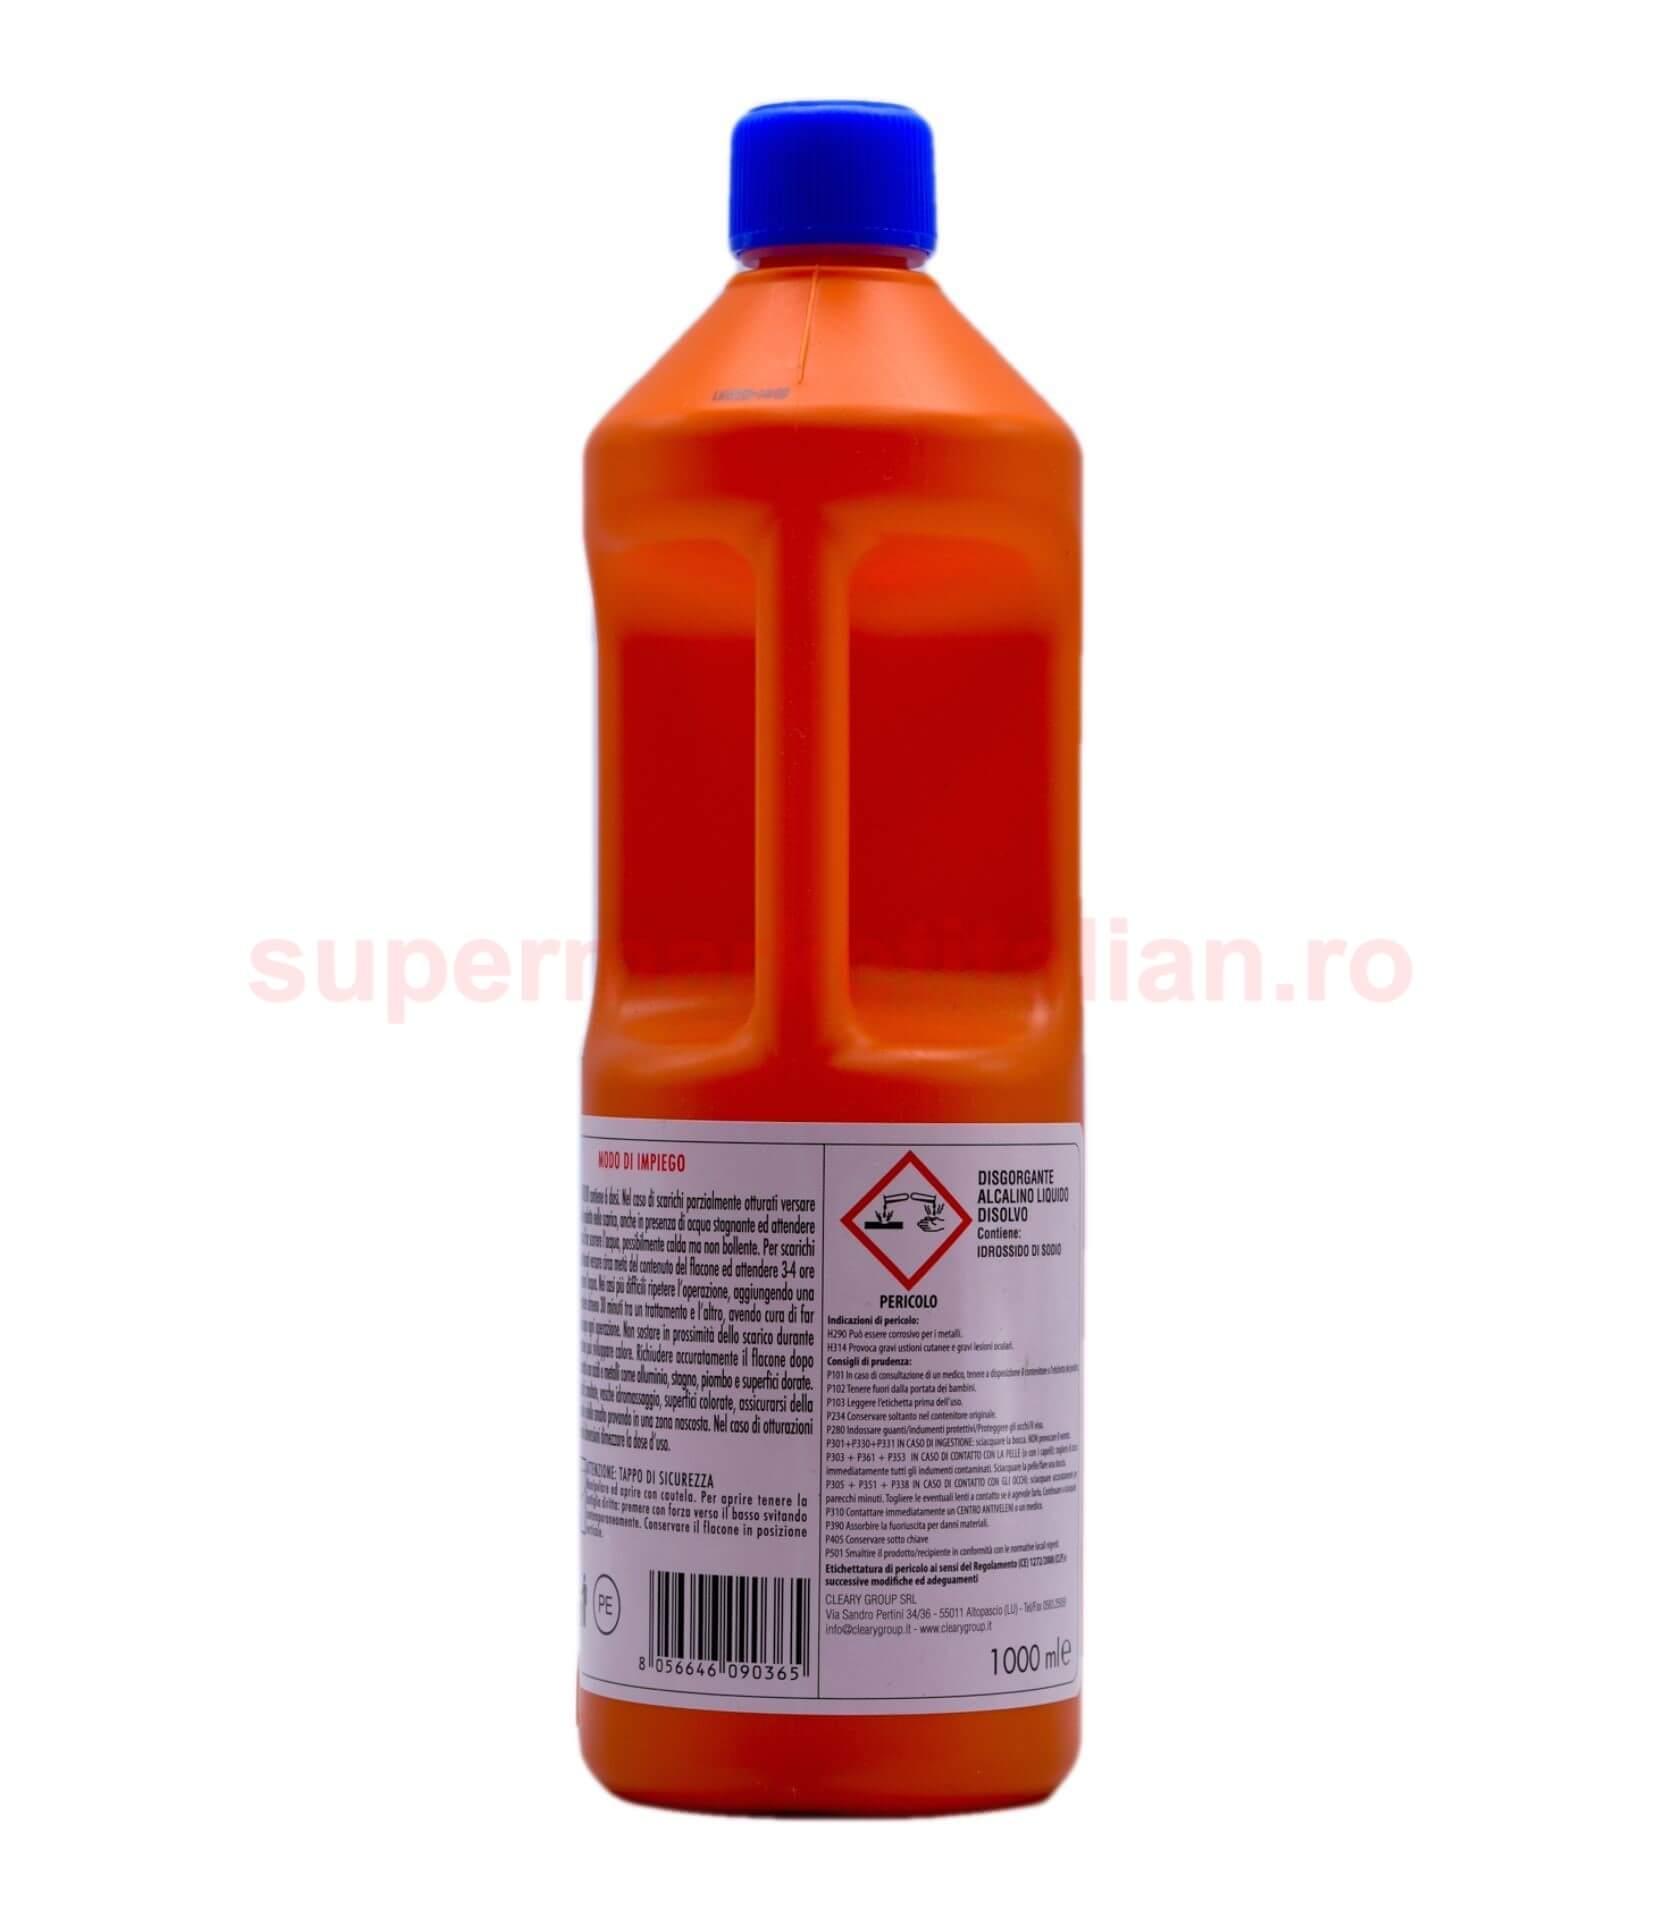 Solutie Lichida Alcalina pentru desfundat tevi Disolvo 8056646090365 2